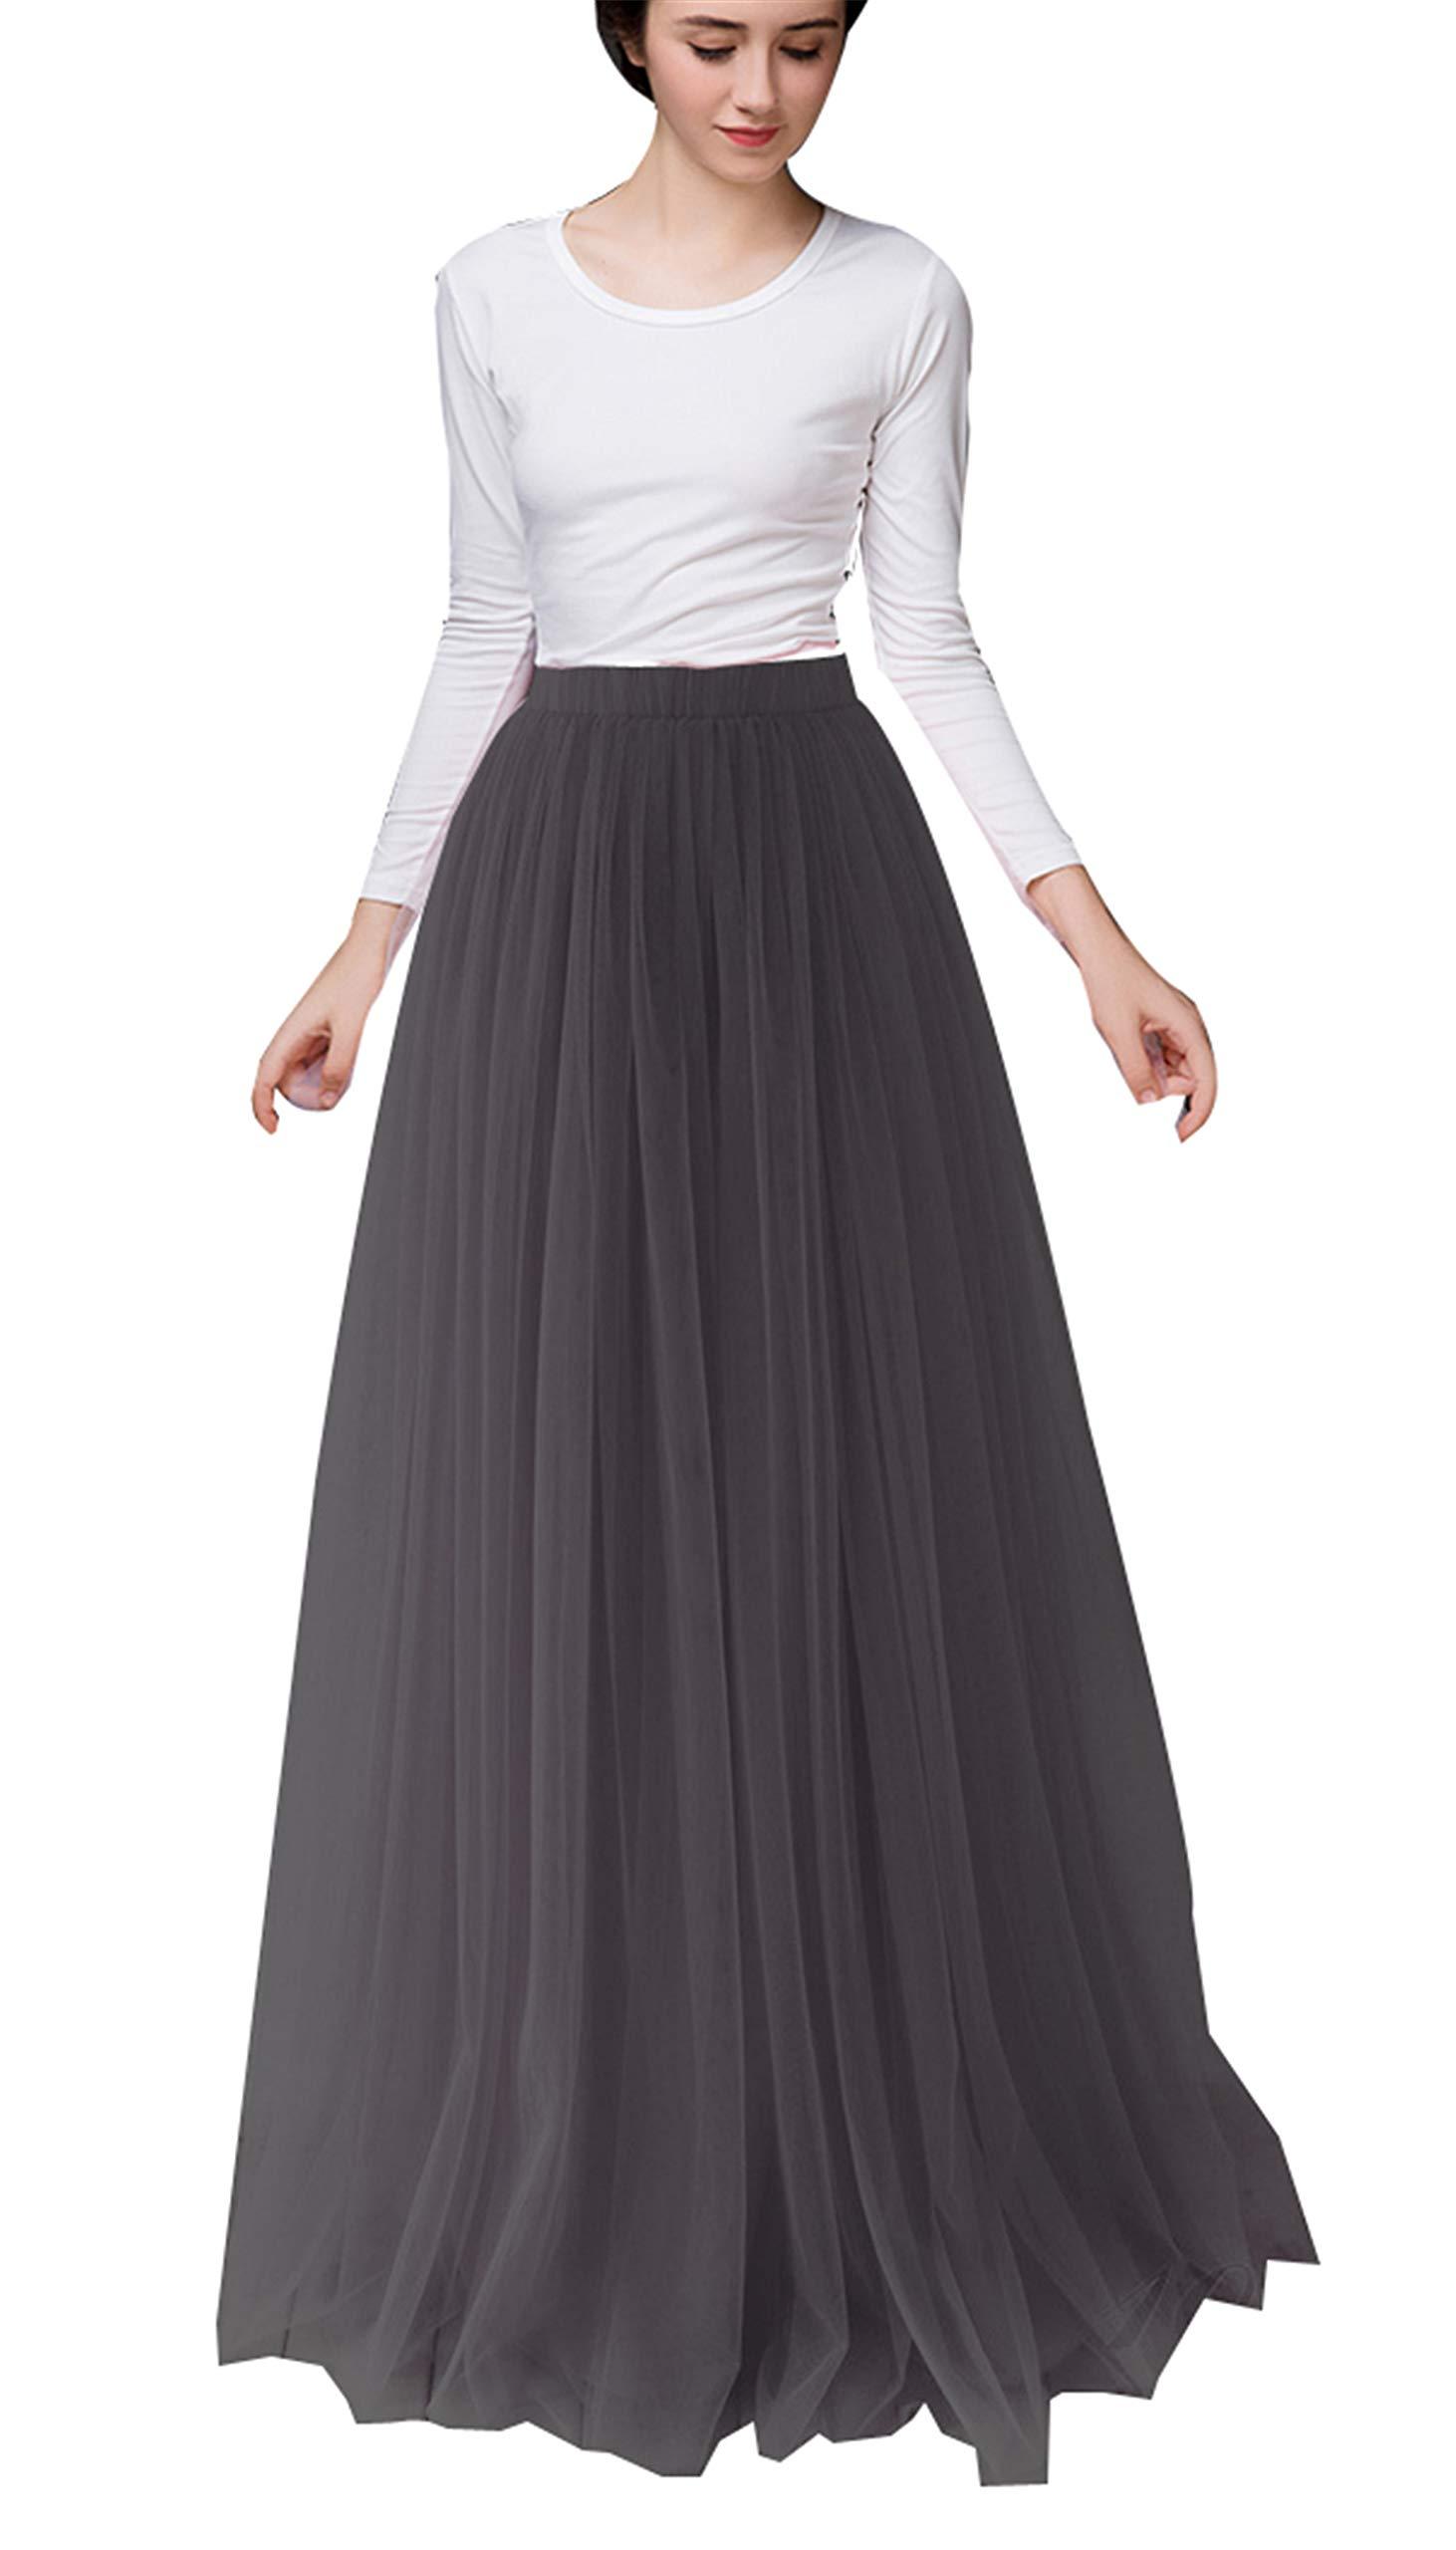 Uswear Women Long Tulle Skirt Dress Floor Length for Wedding Bridal Bridesmaids High Waisted Maxi Tutu Party Dress (Black, Waist:65-95cm)